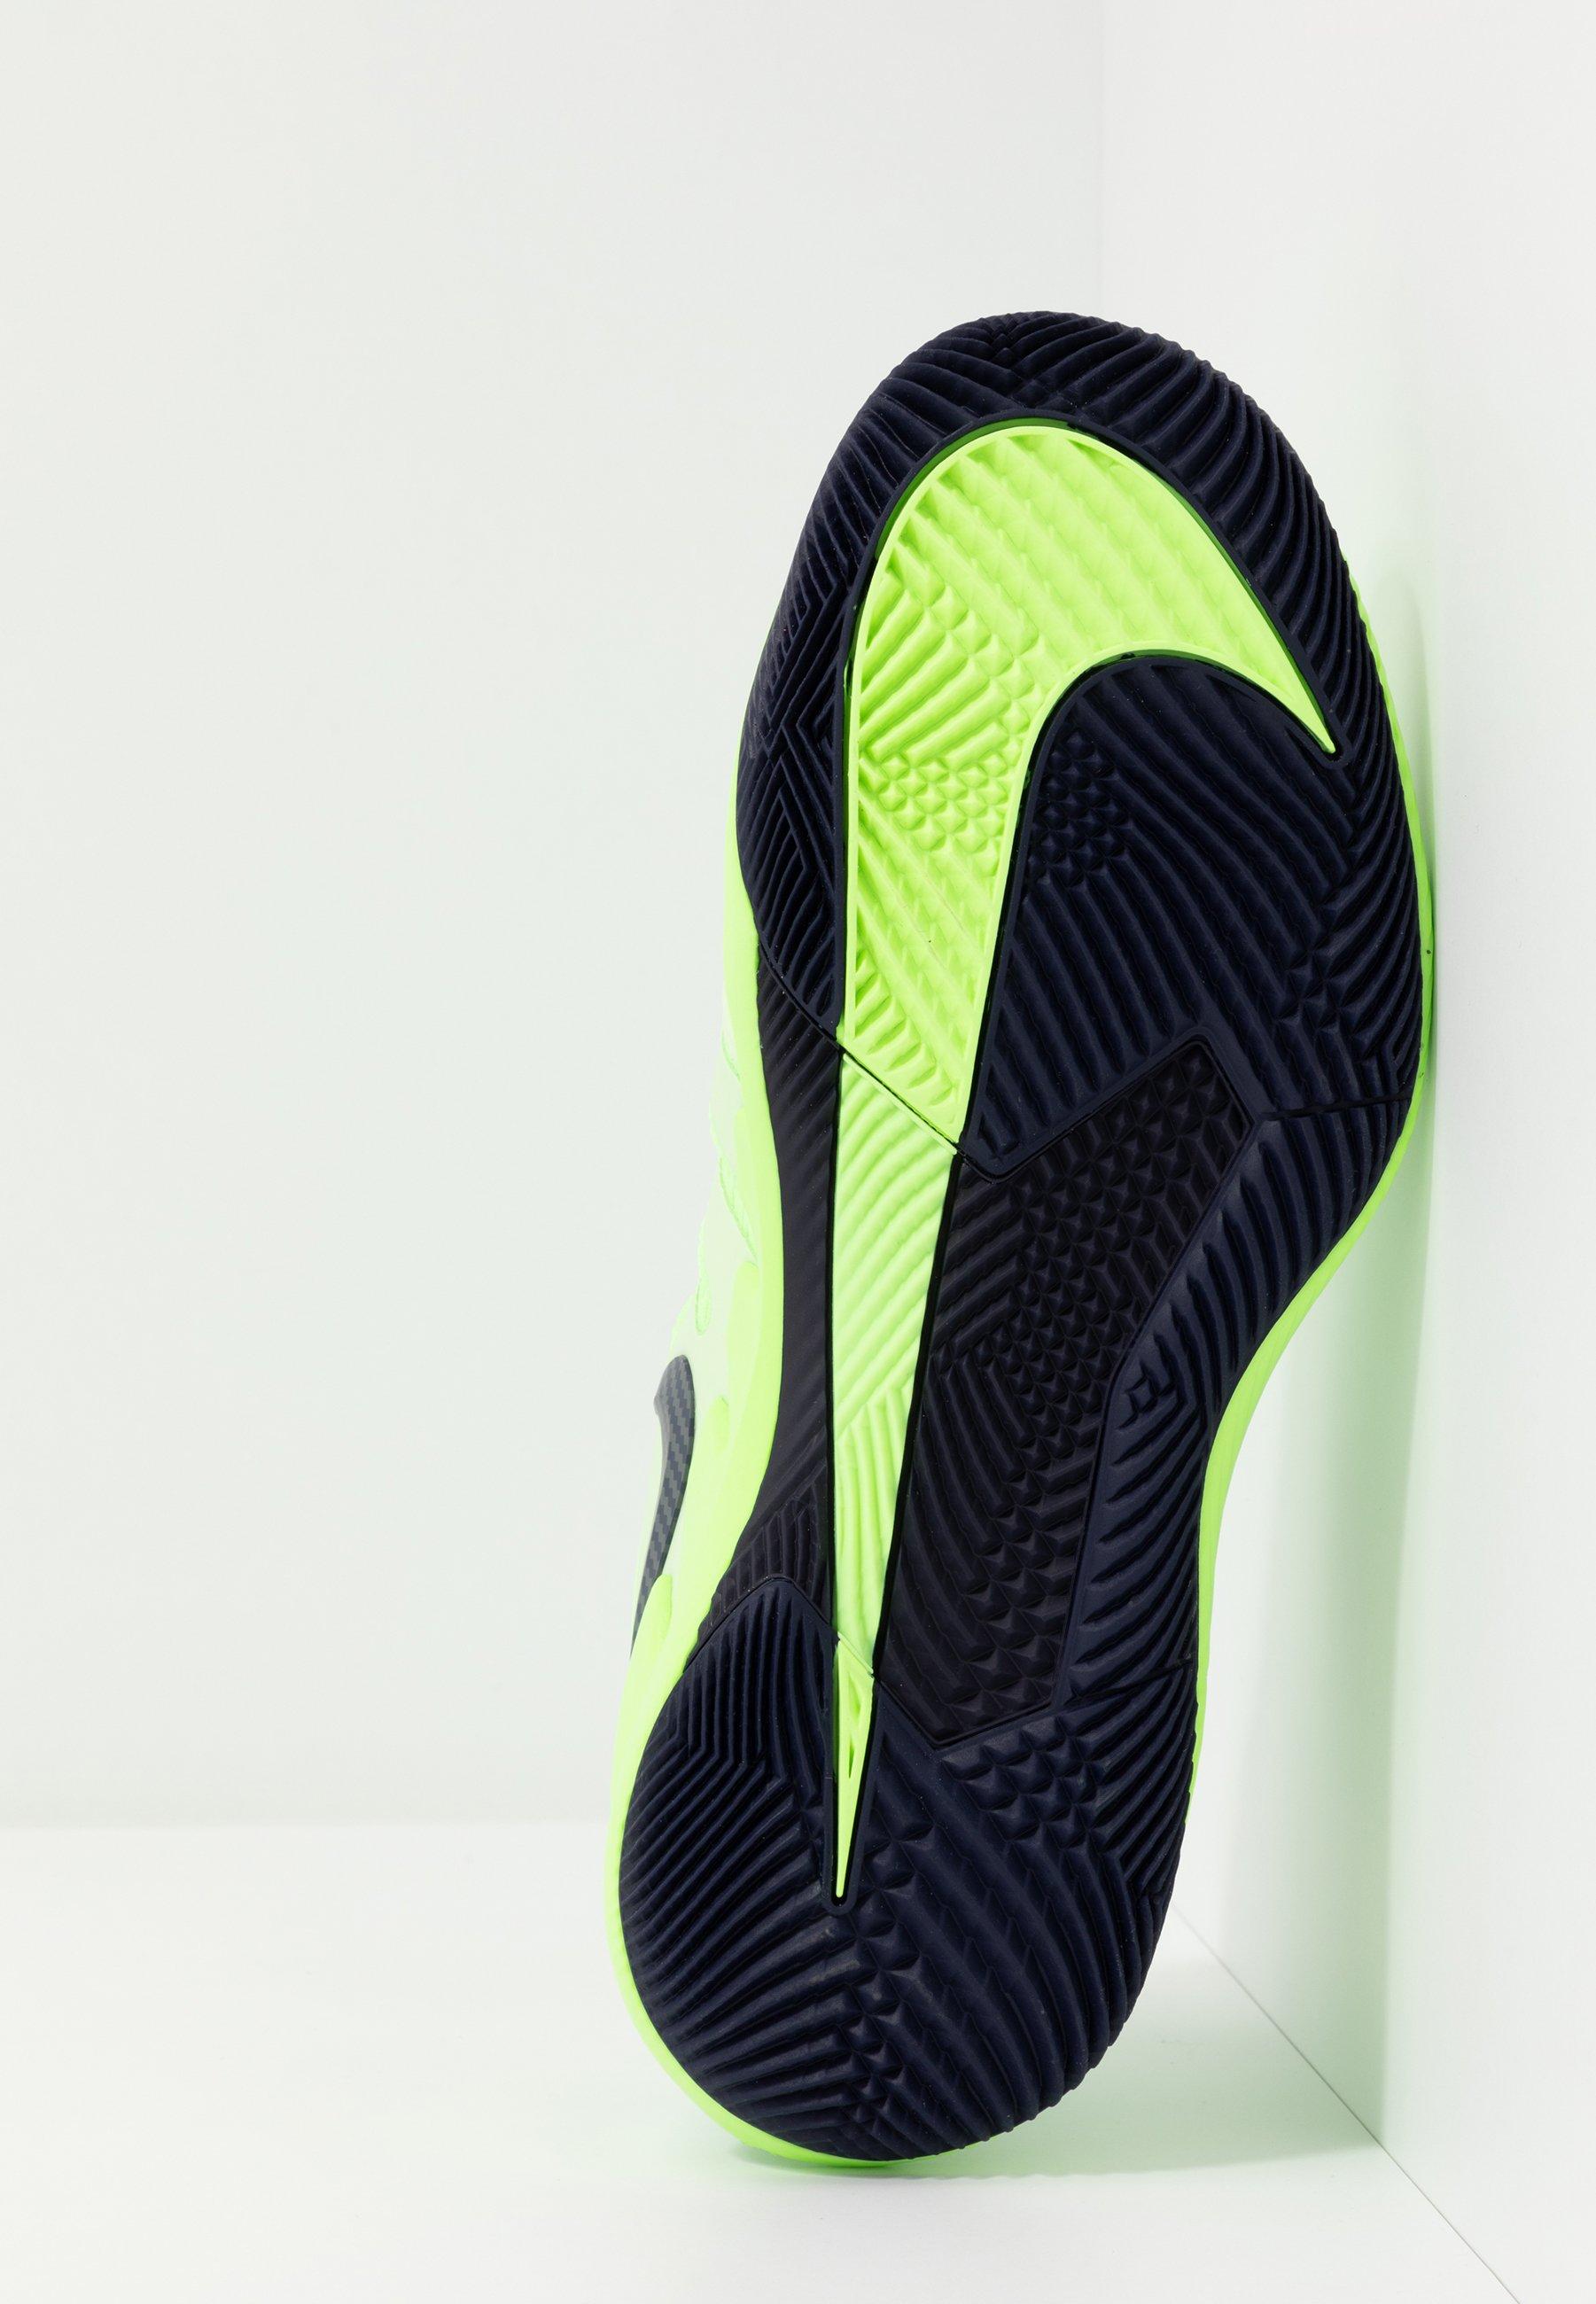 Nike Performance AIR ZOOM VAPOR X - Multicourt Tennisschuh - ghost green/blackened blue/barely volt/grün - Herrenschuhe gy5tN